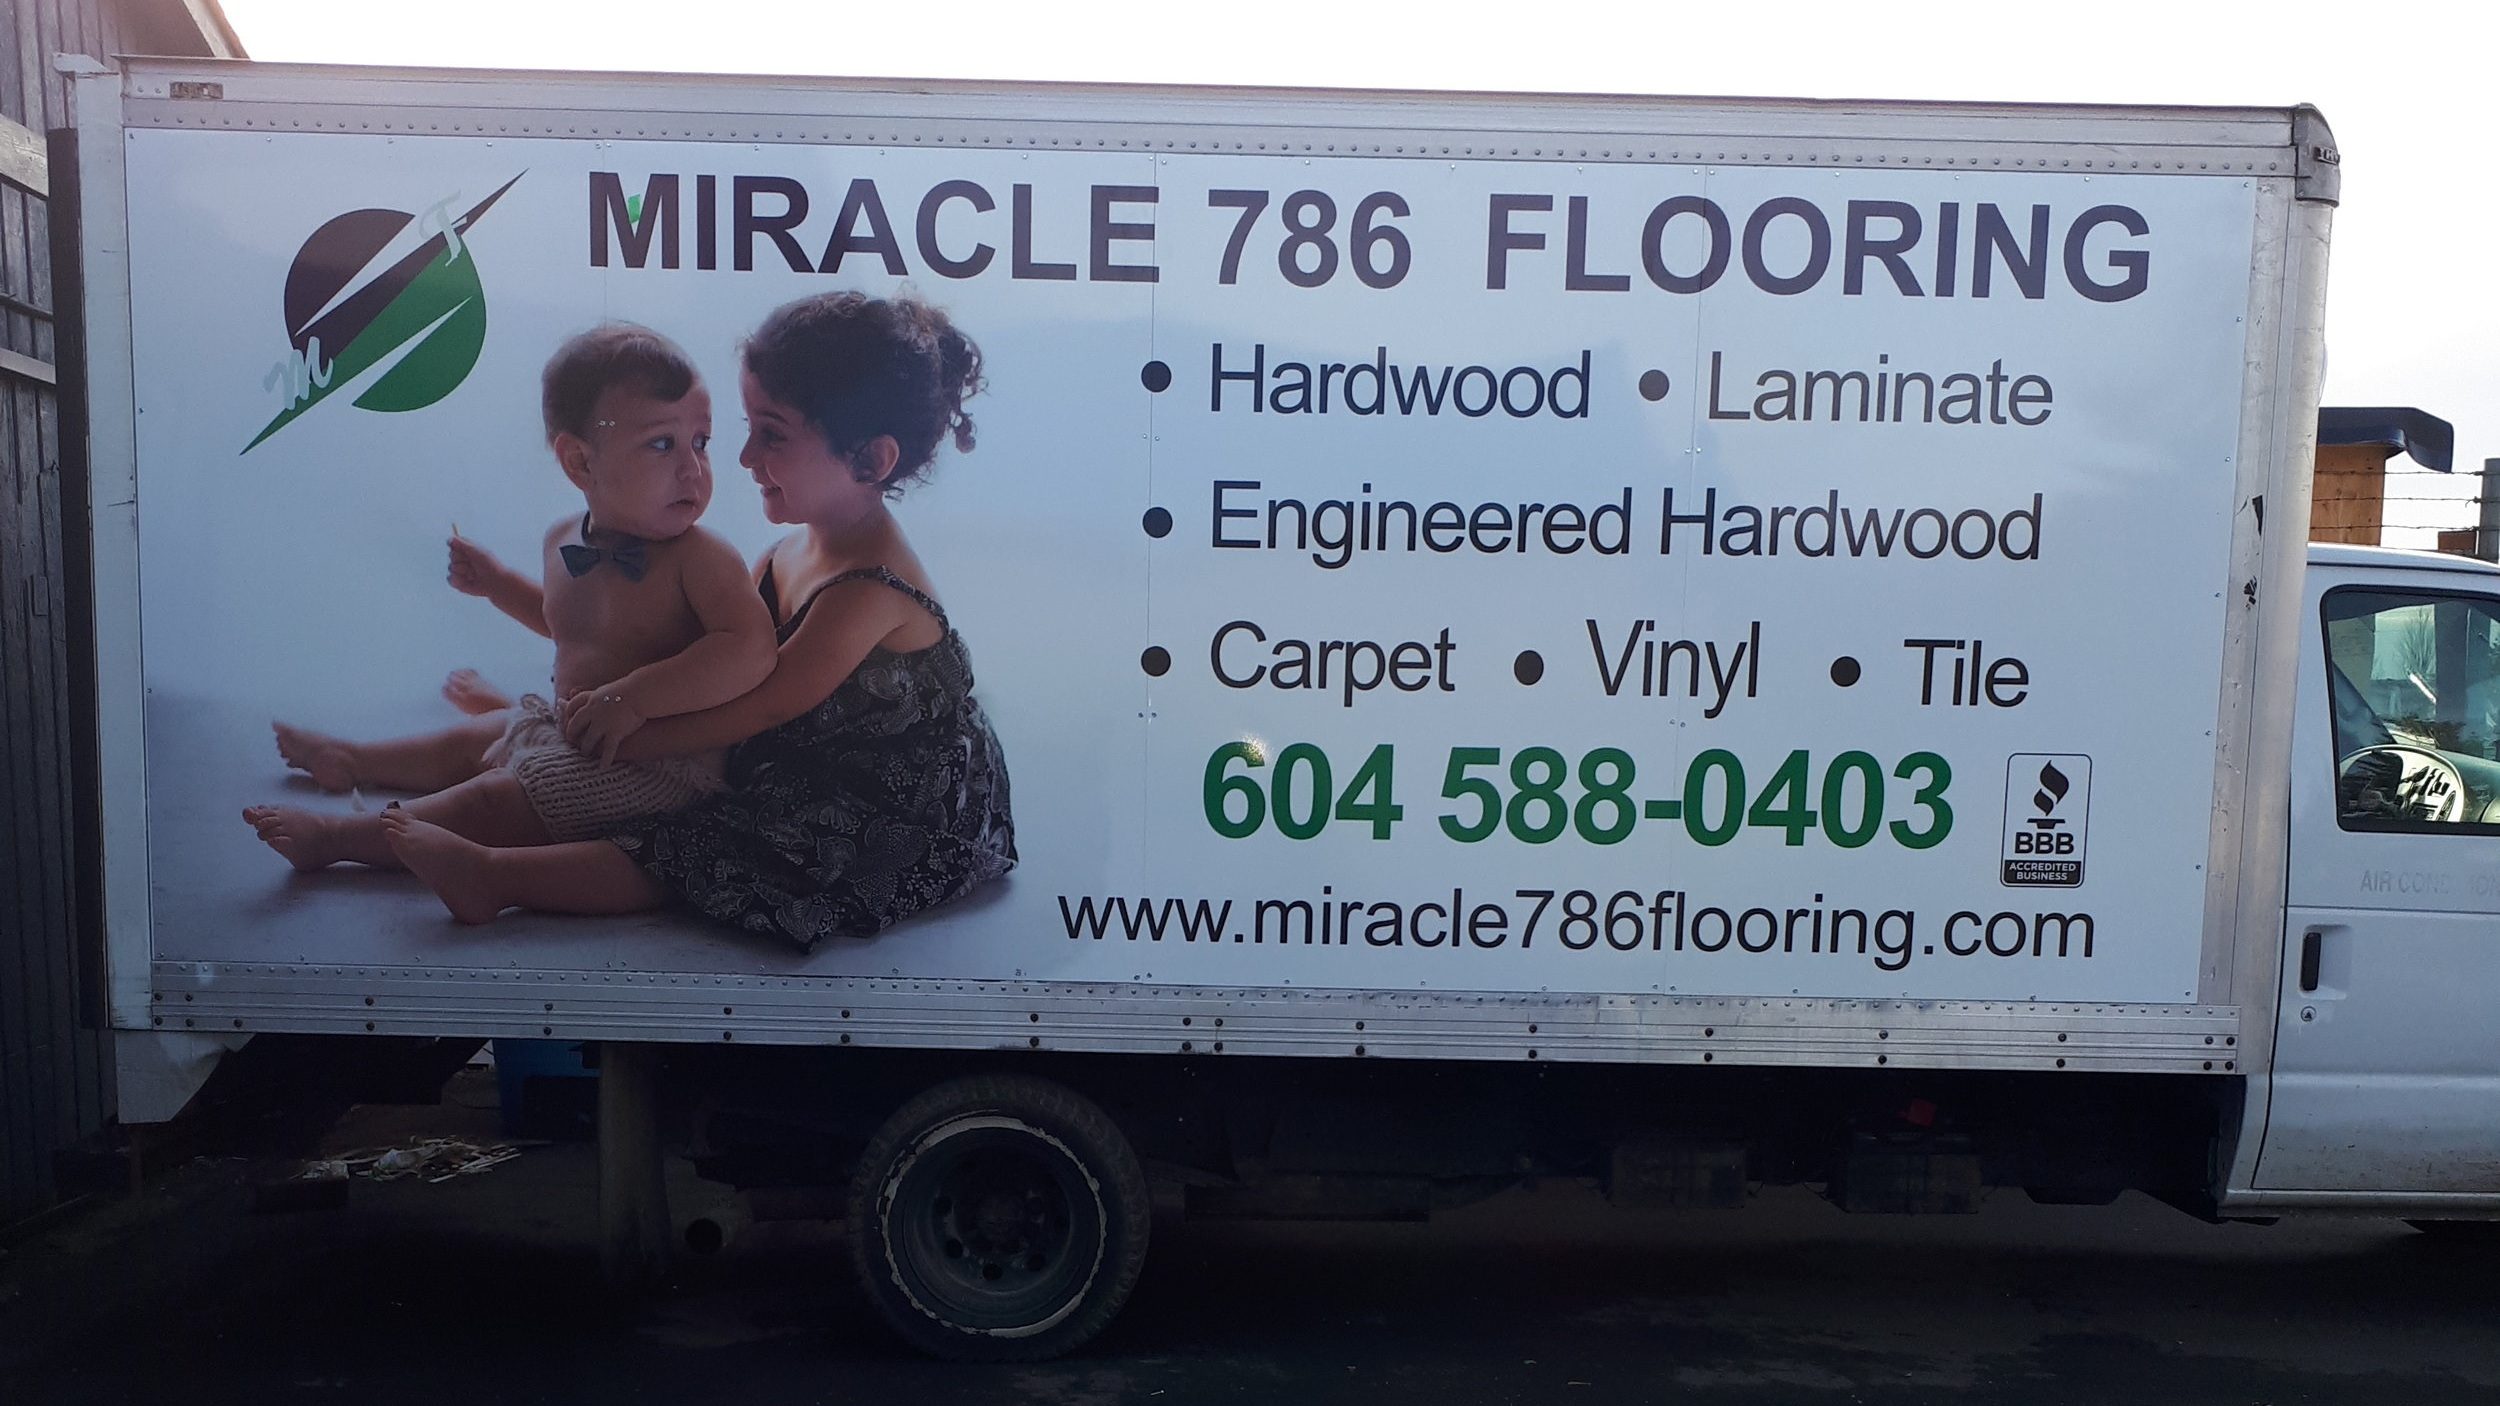 Miracle 786 Flooring - Vinyl car graphics.